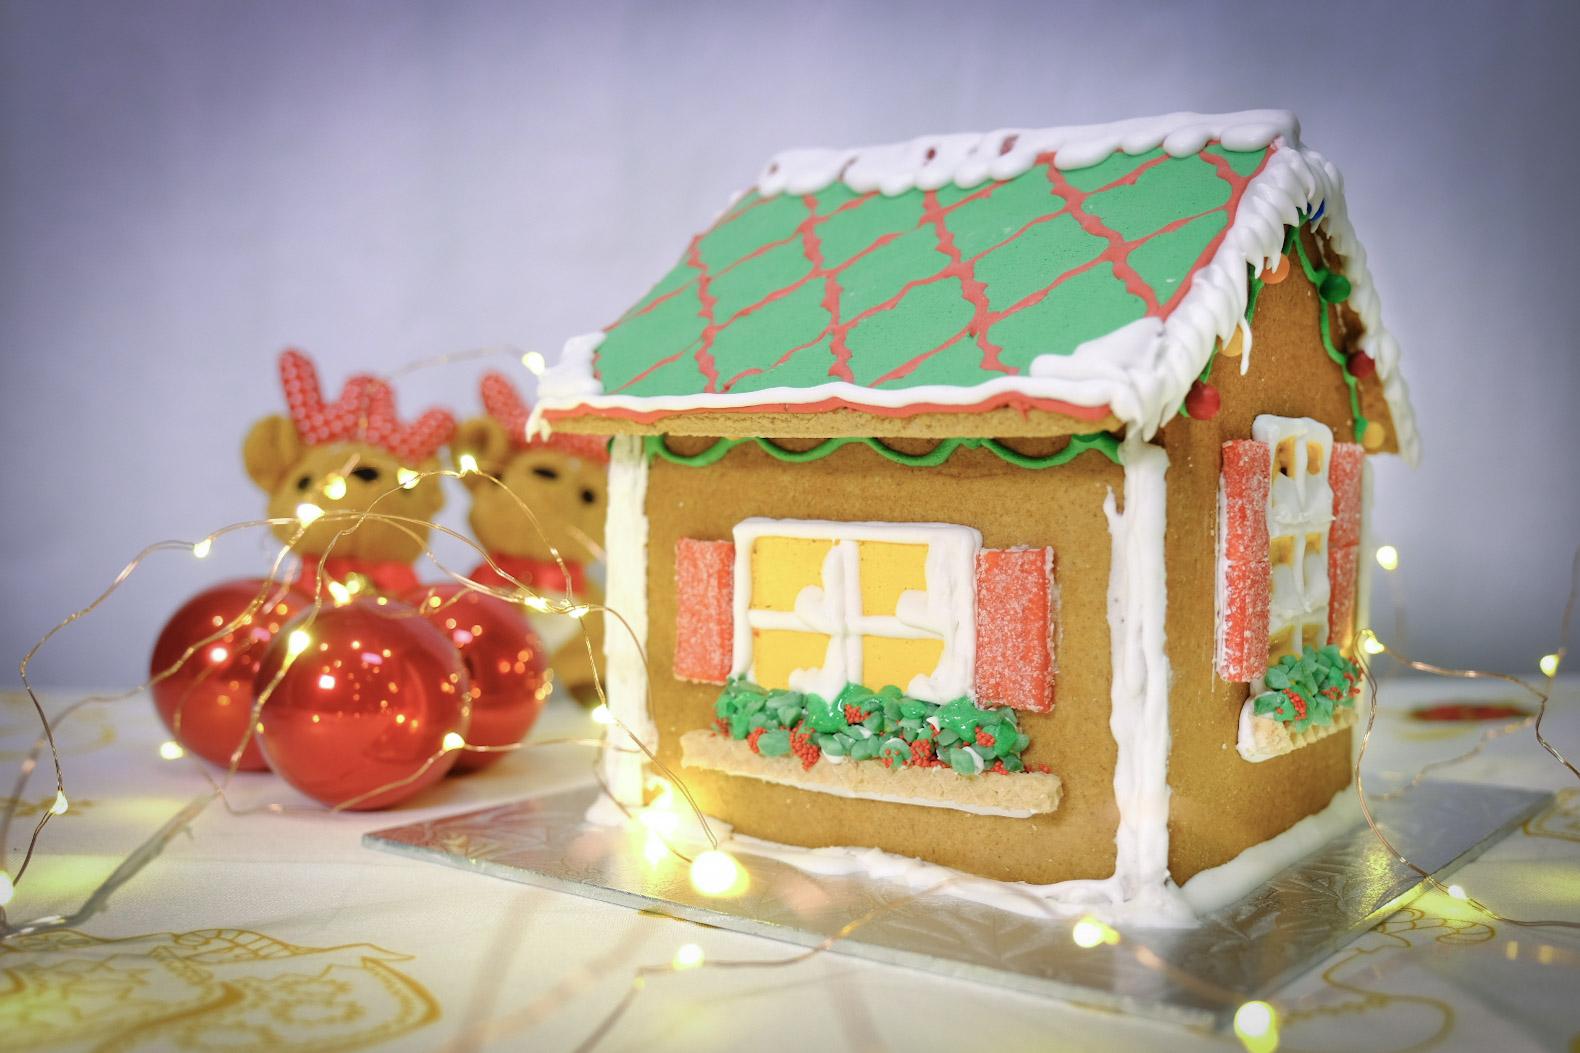 Christmas Gingerbread House Kit.Diy 3d Large Gingerbread House Kit